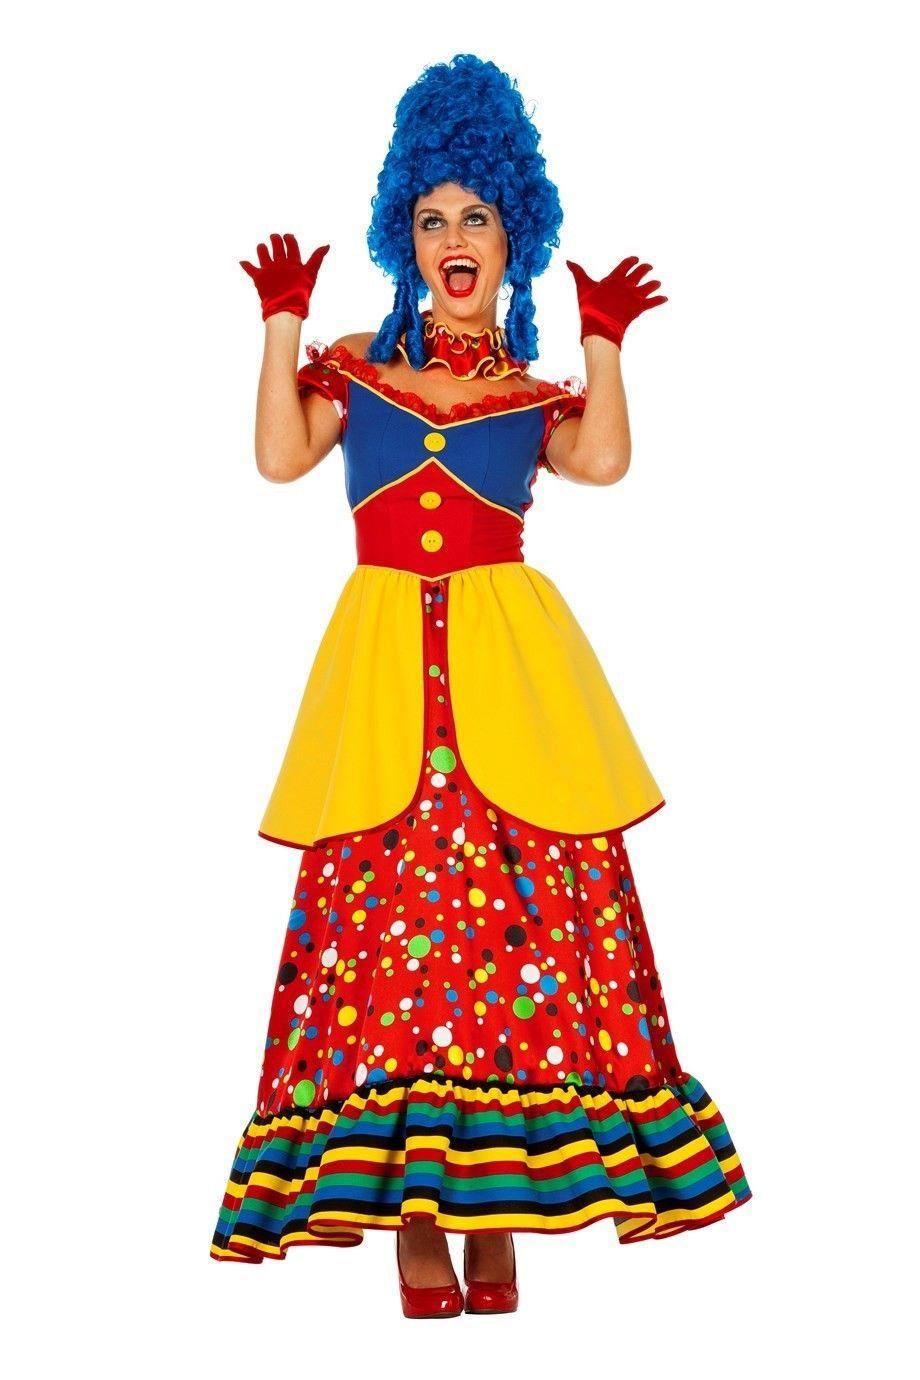 Carnavalskleding Dames Clown.Dames Clown In Een Vernieuwende Uitvoering Bestaande Uit Jurk En